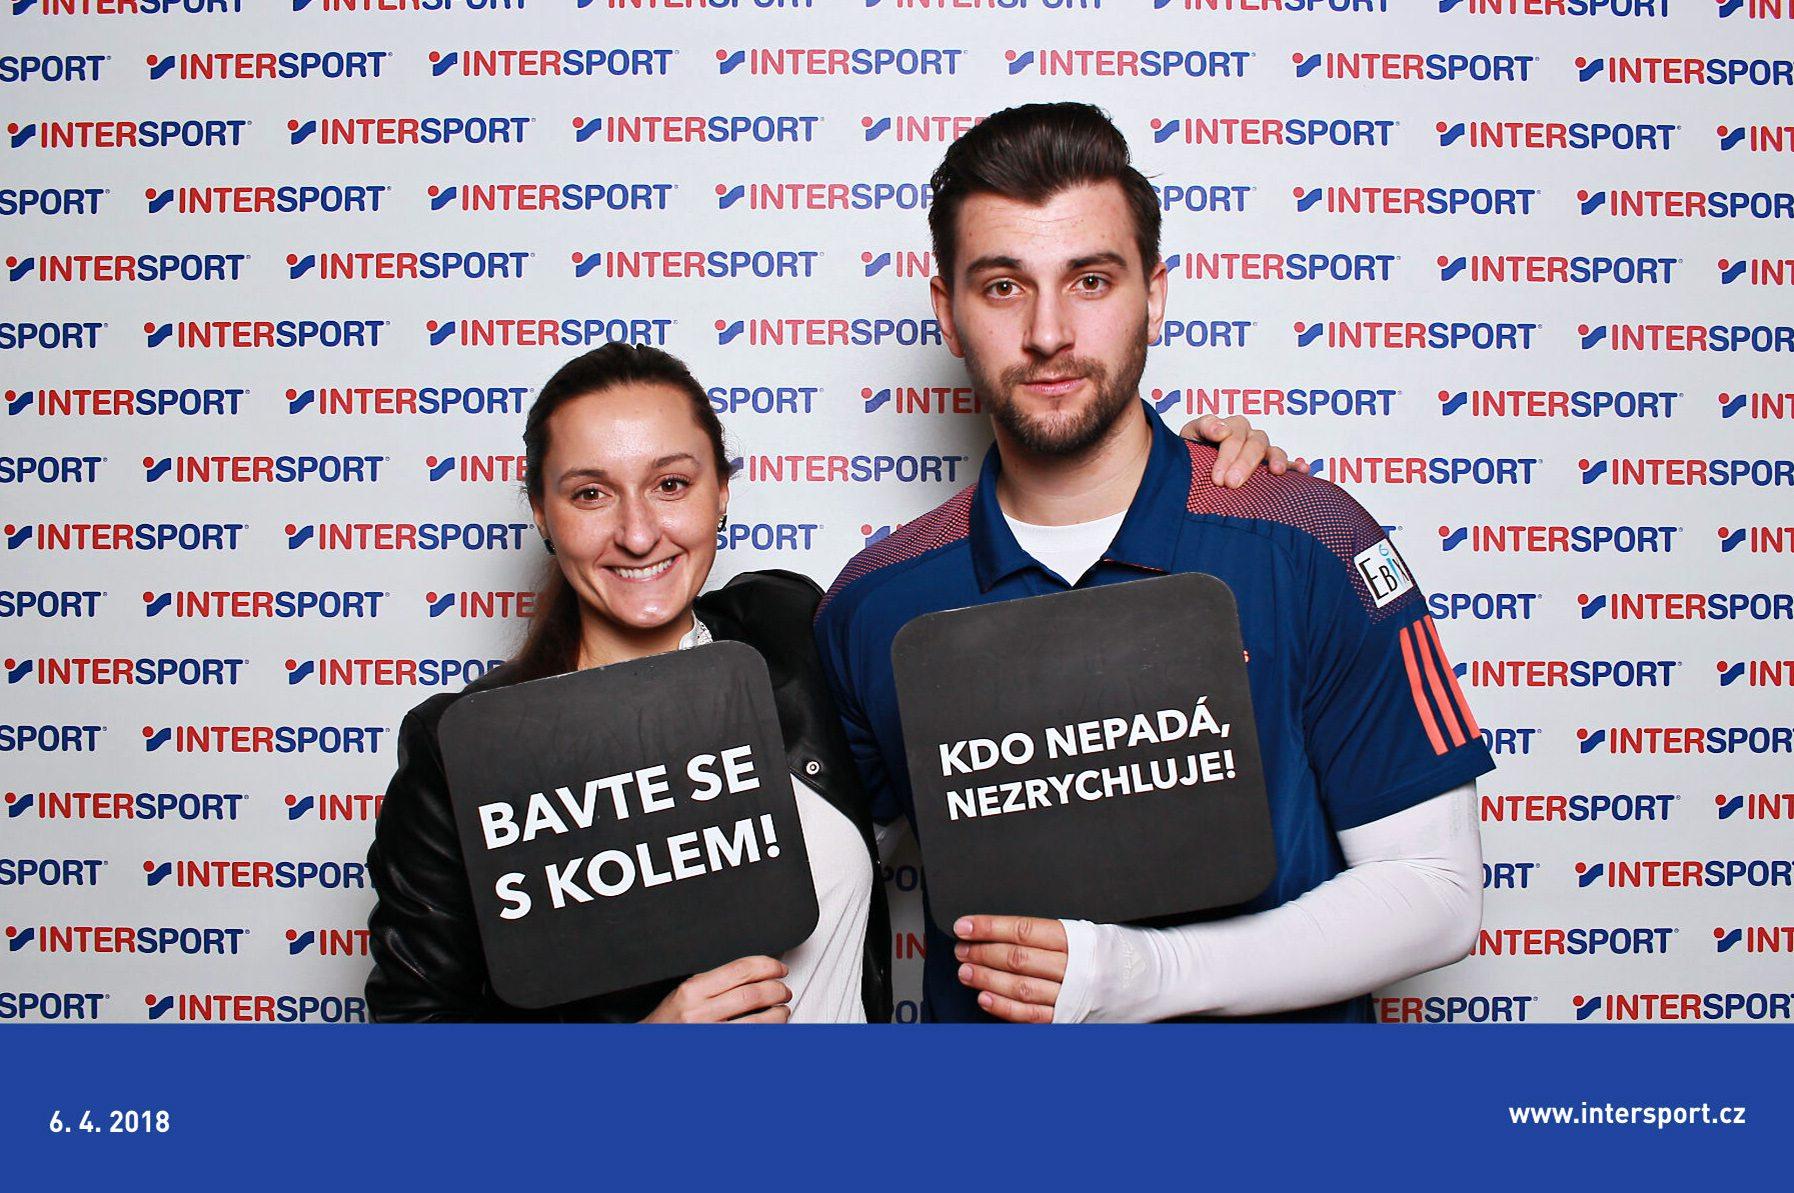 fotokoutek-intersport-for-bikes-pva-letnany-6-4-2018-405489